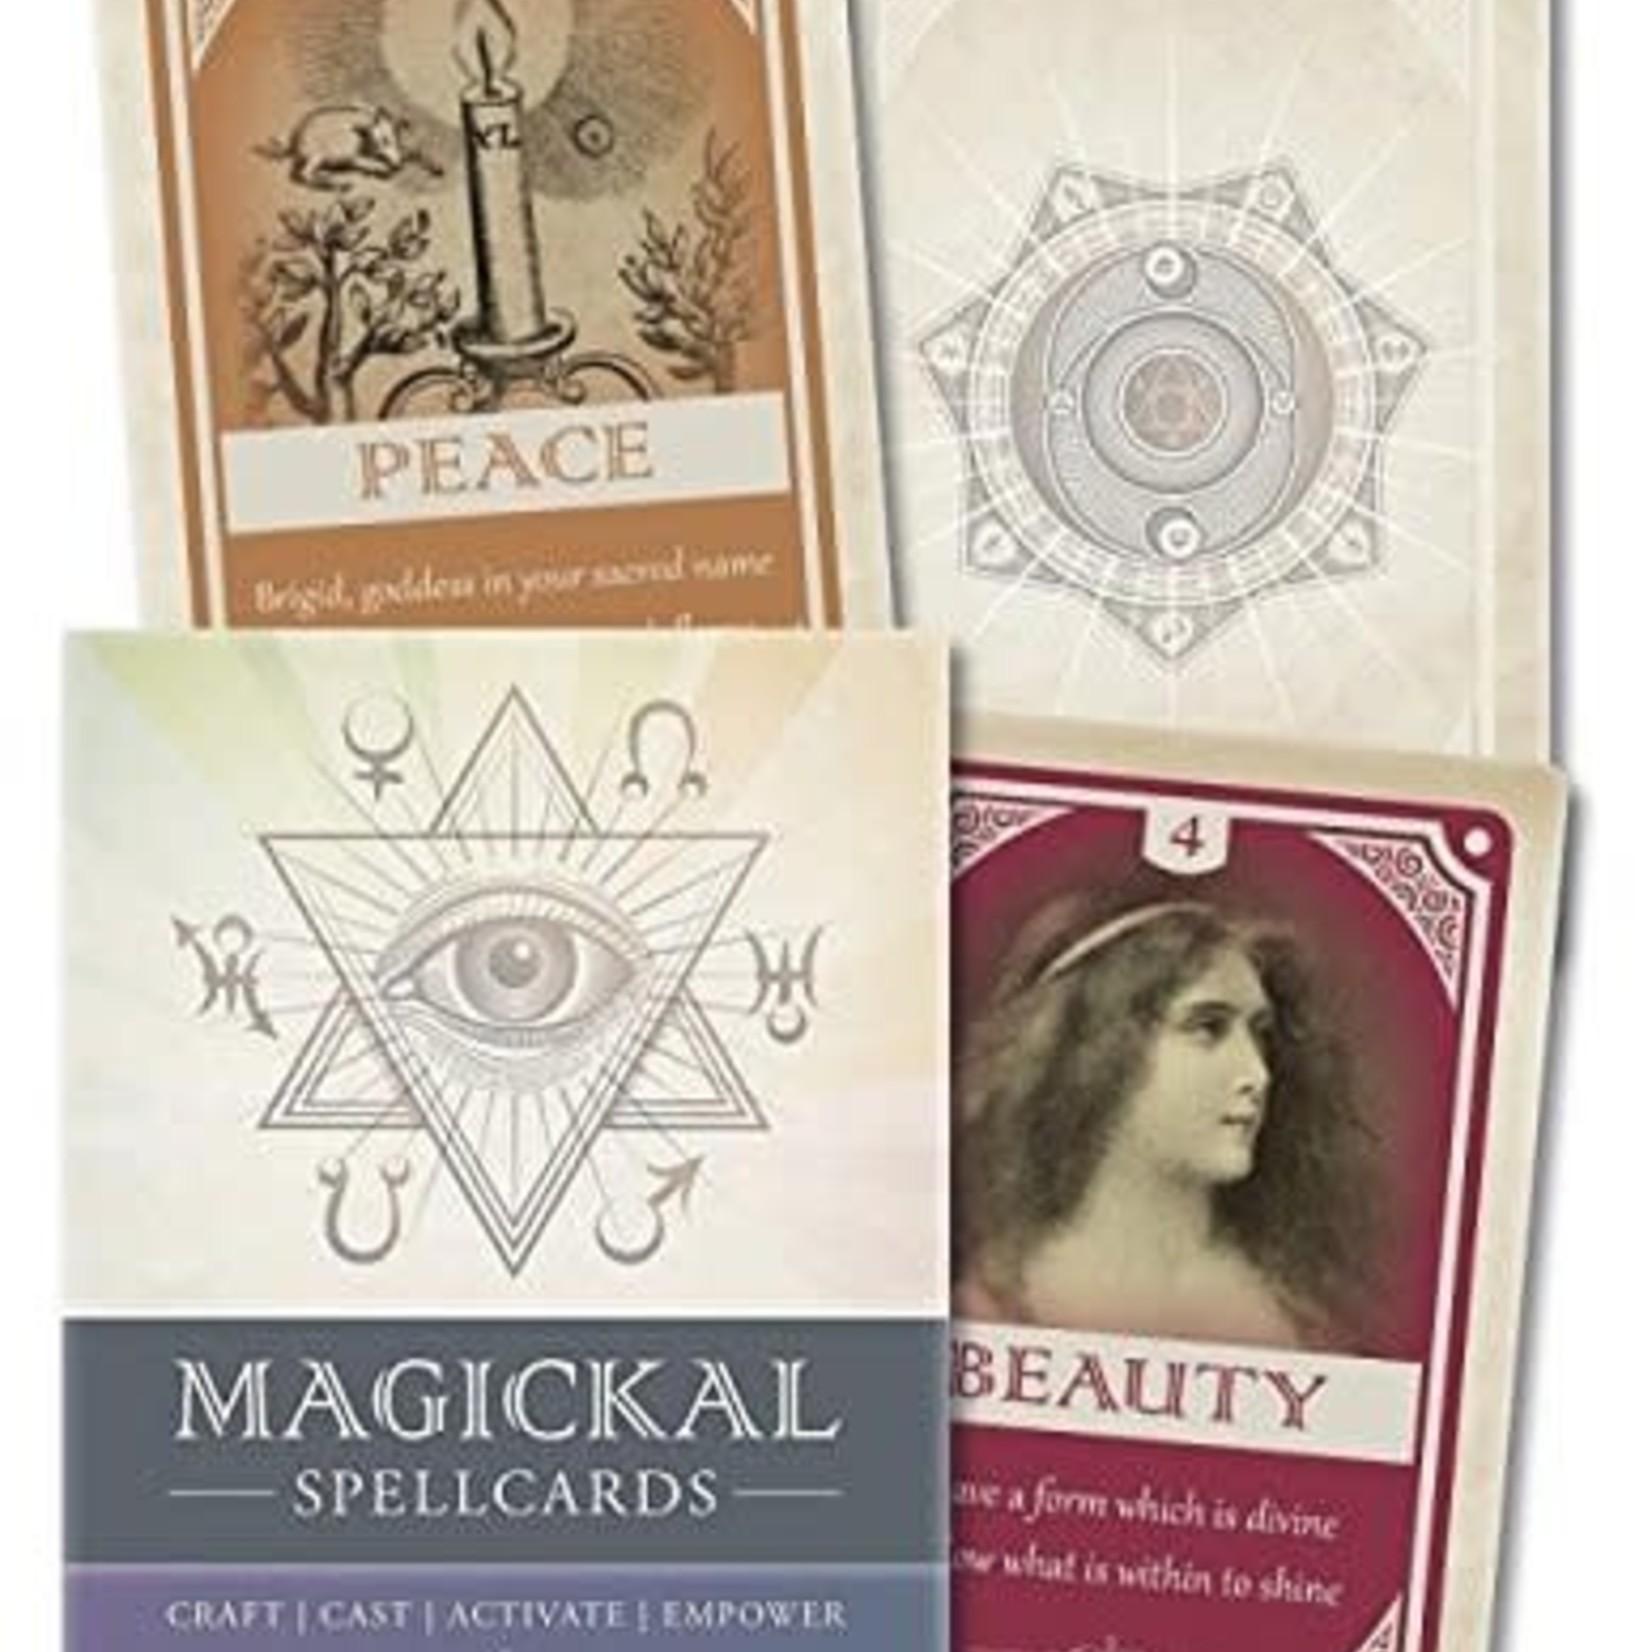 Magikal SpellCards